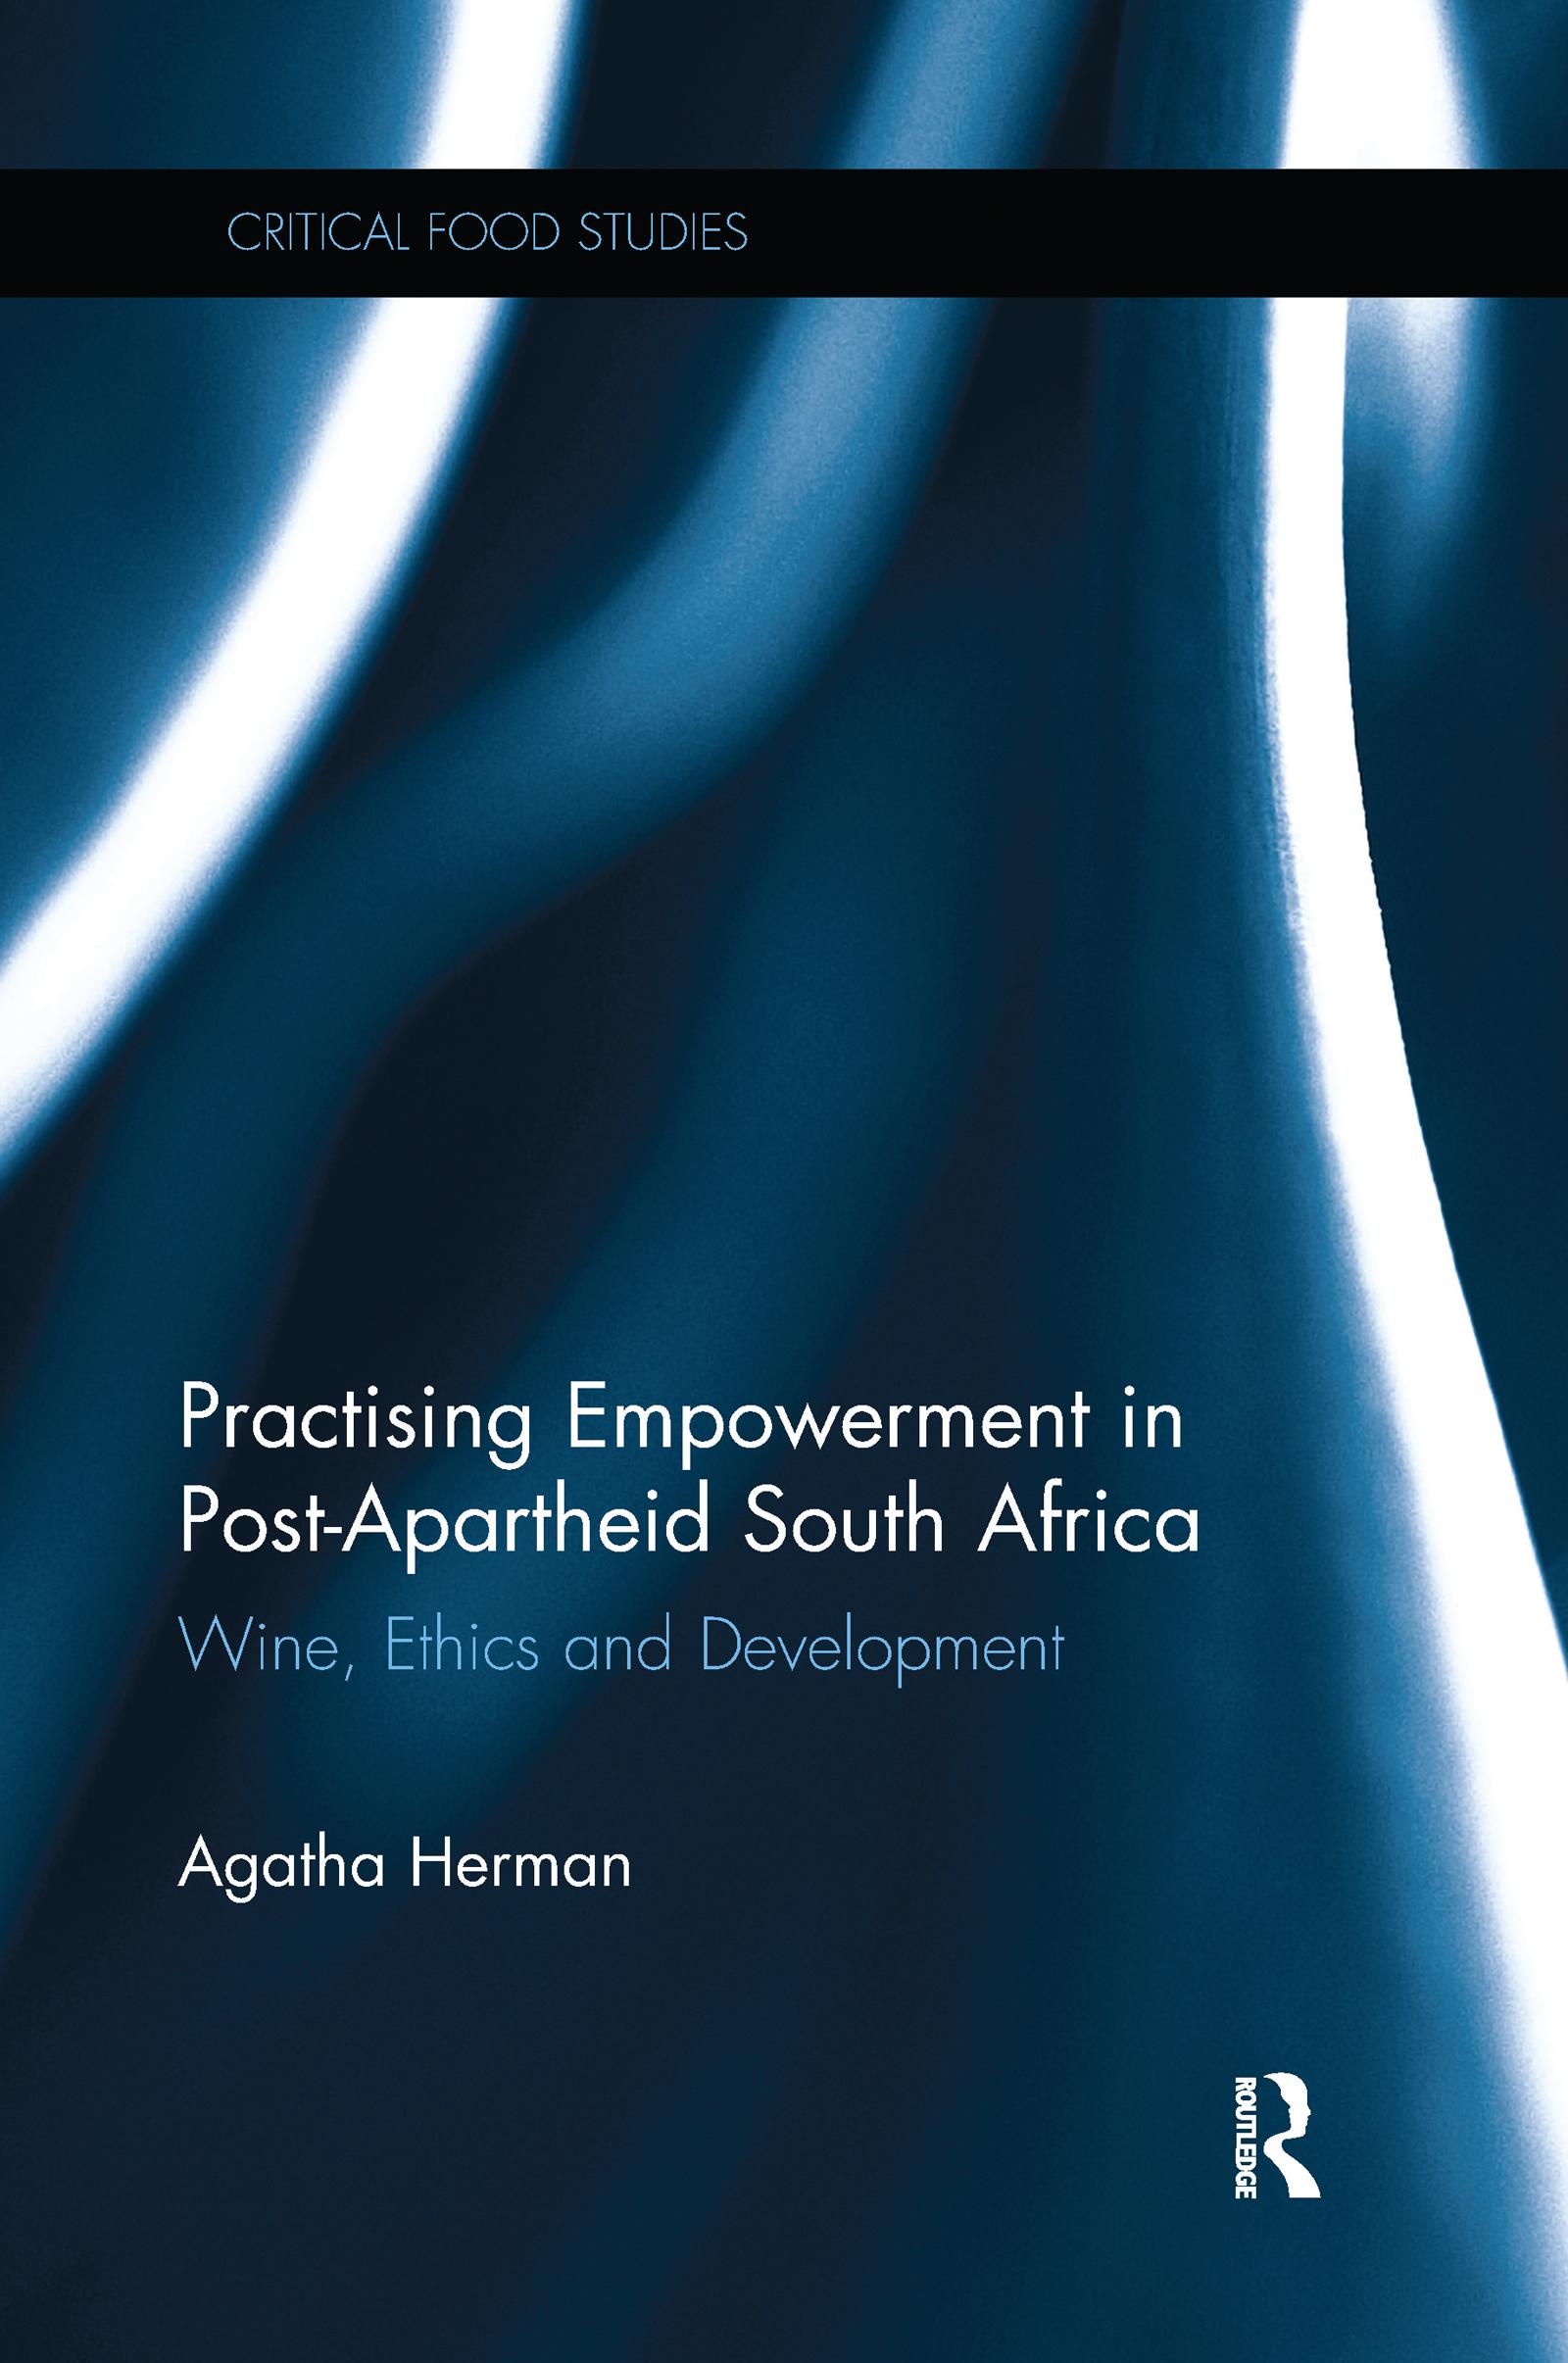 Practising Empowerment in Post-Apartheid South Africa